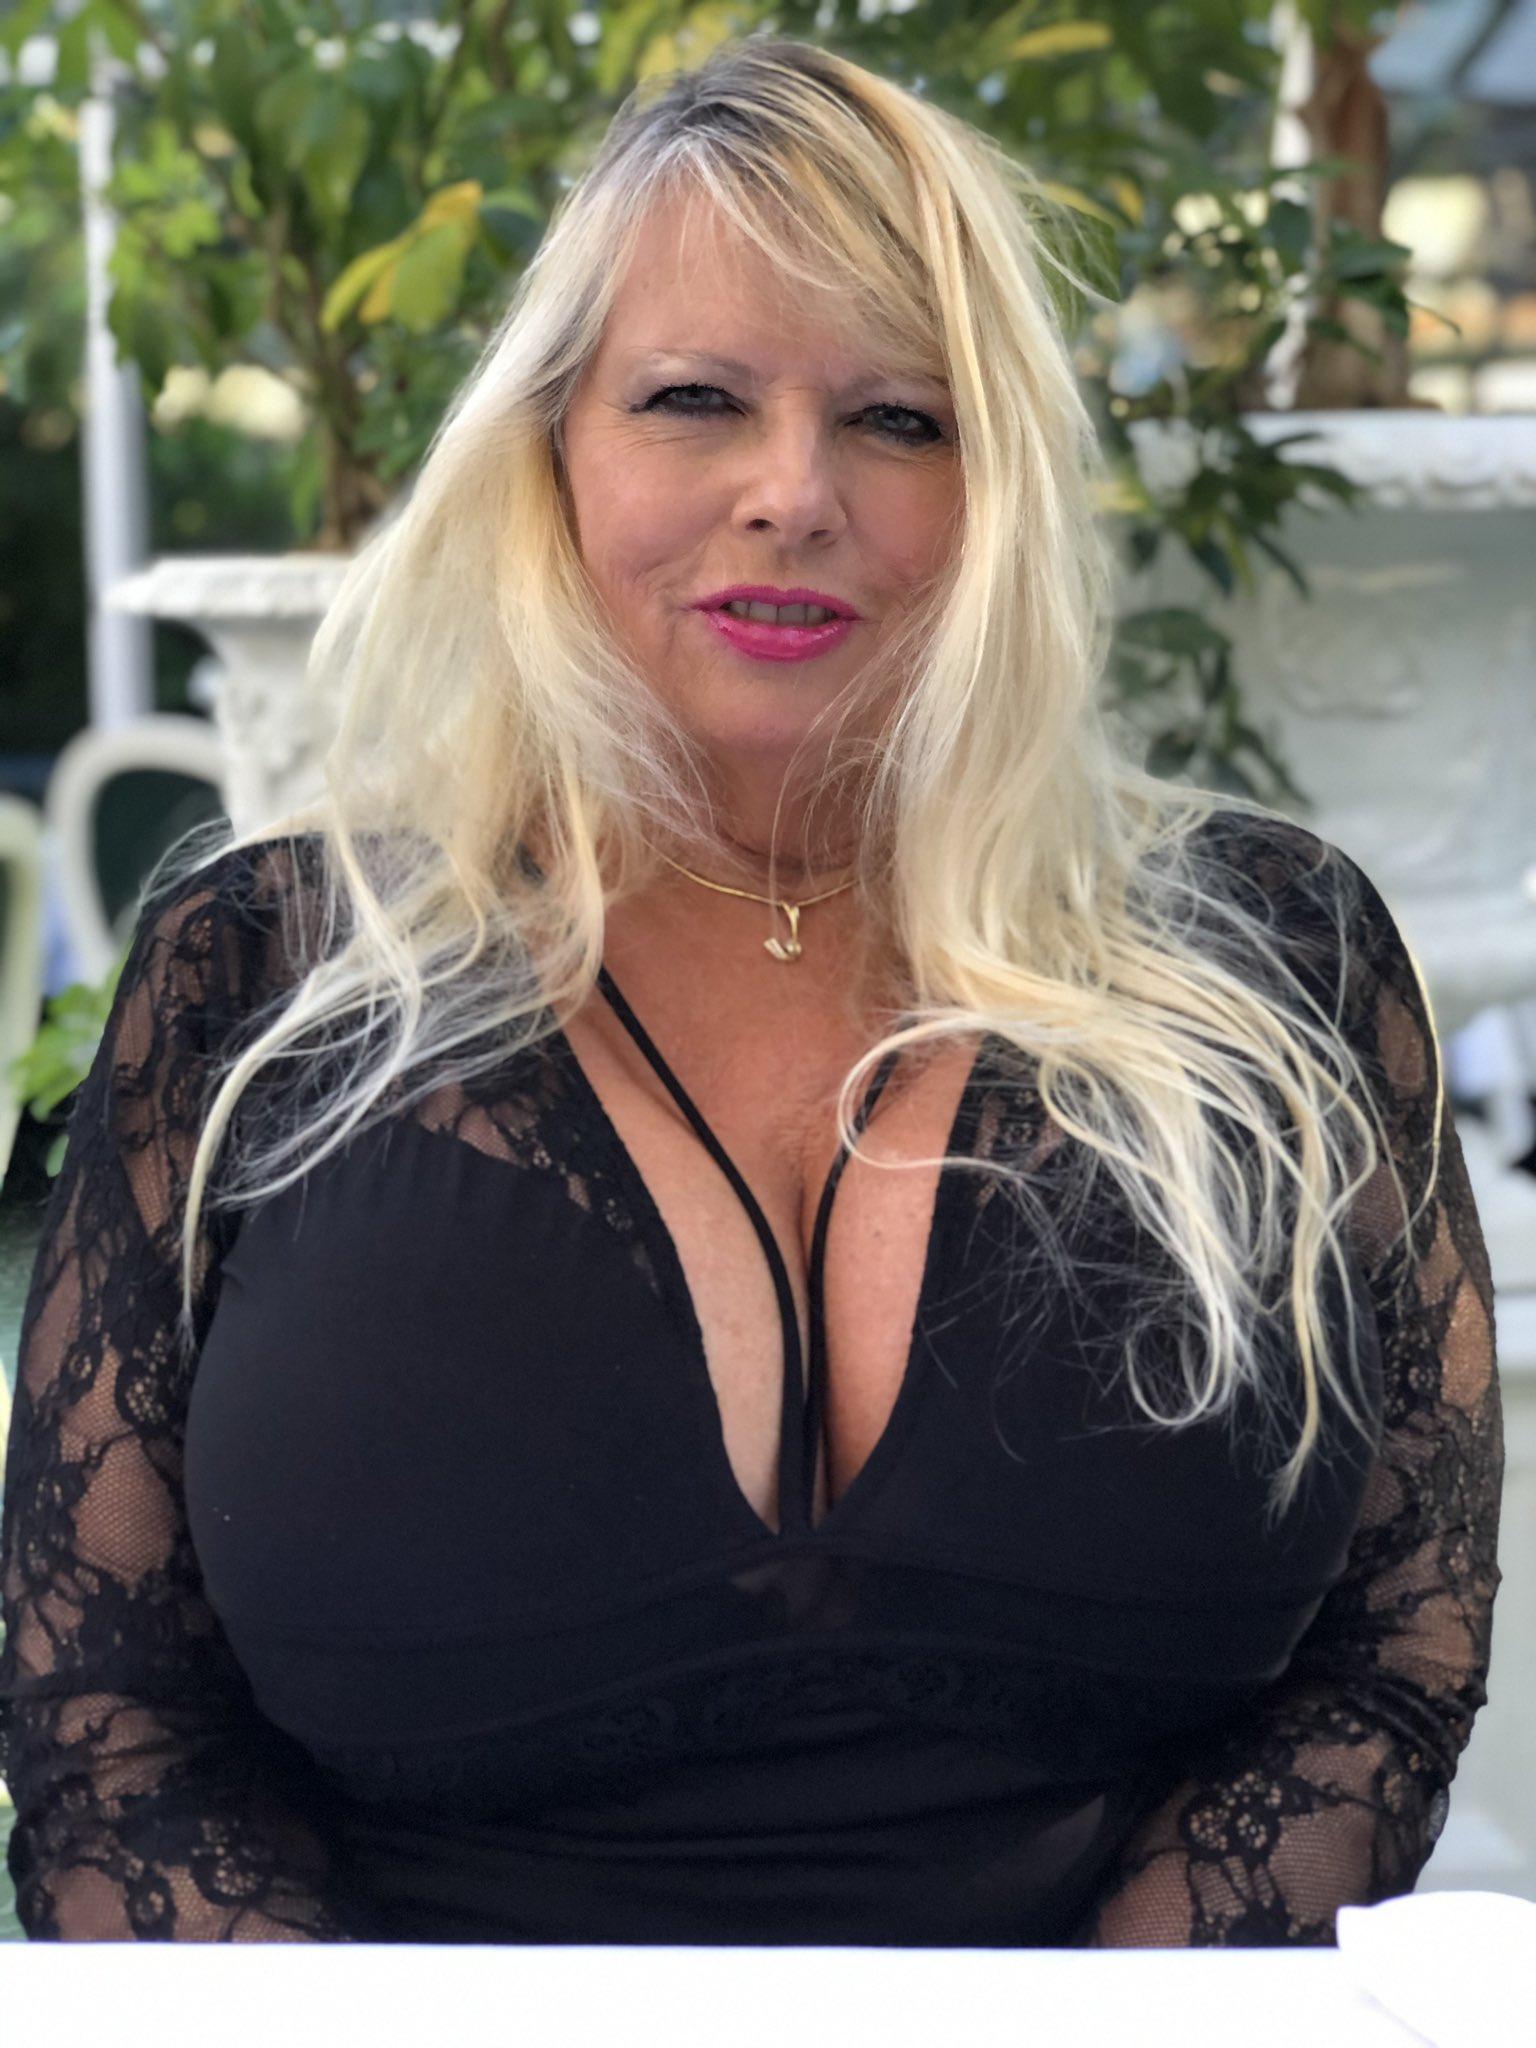 TW Pornstars - 1 pic. Kimberly Kupps. Twitter. Finally